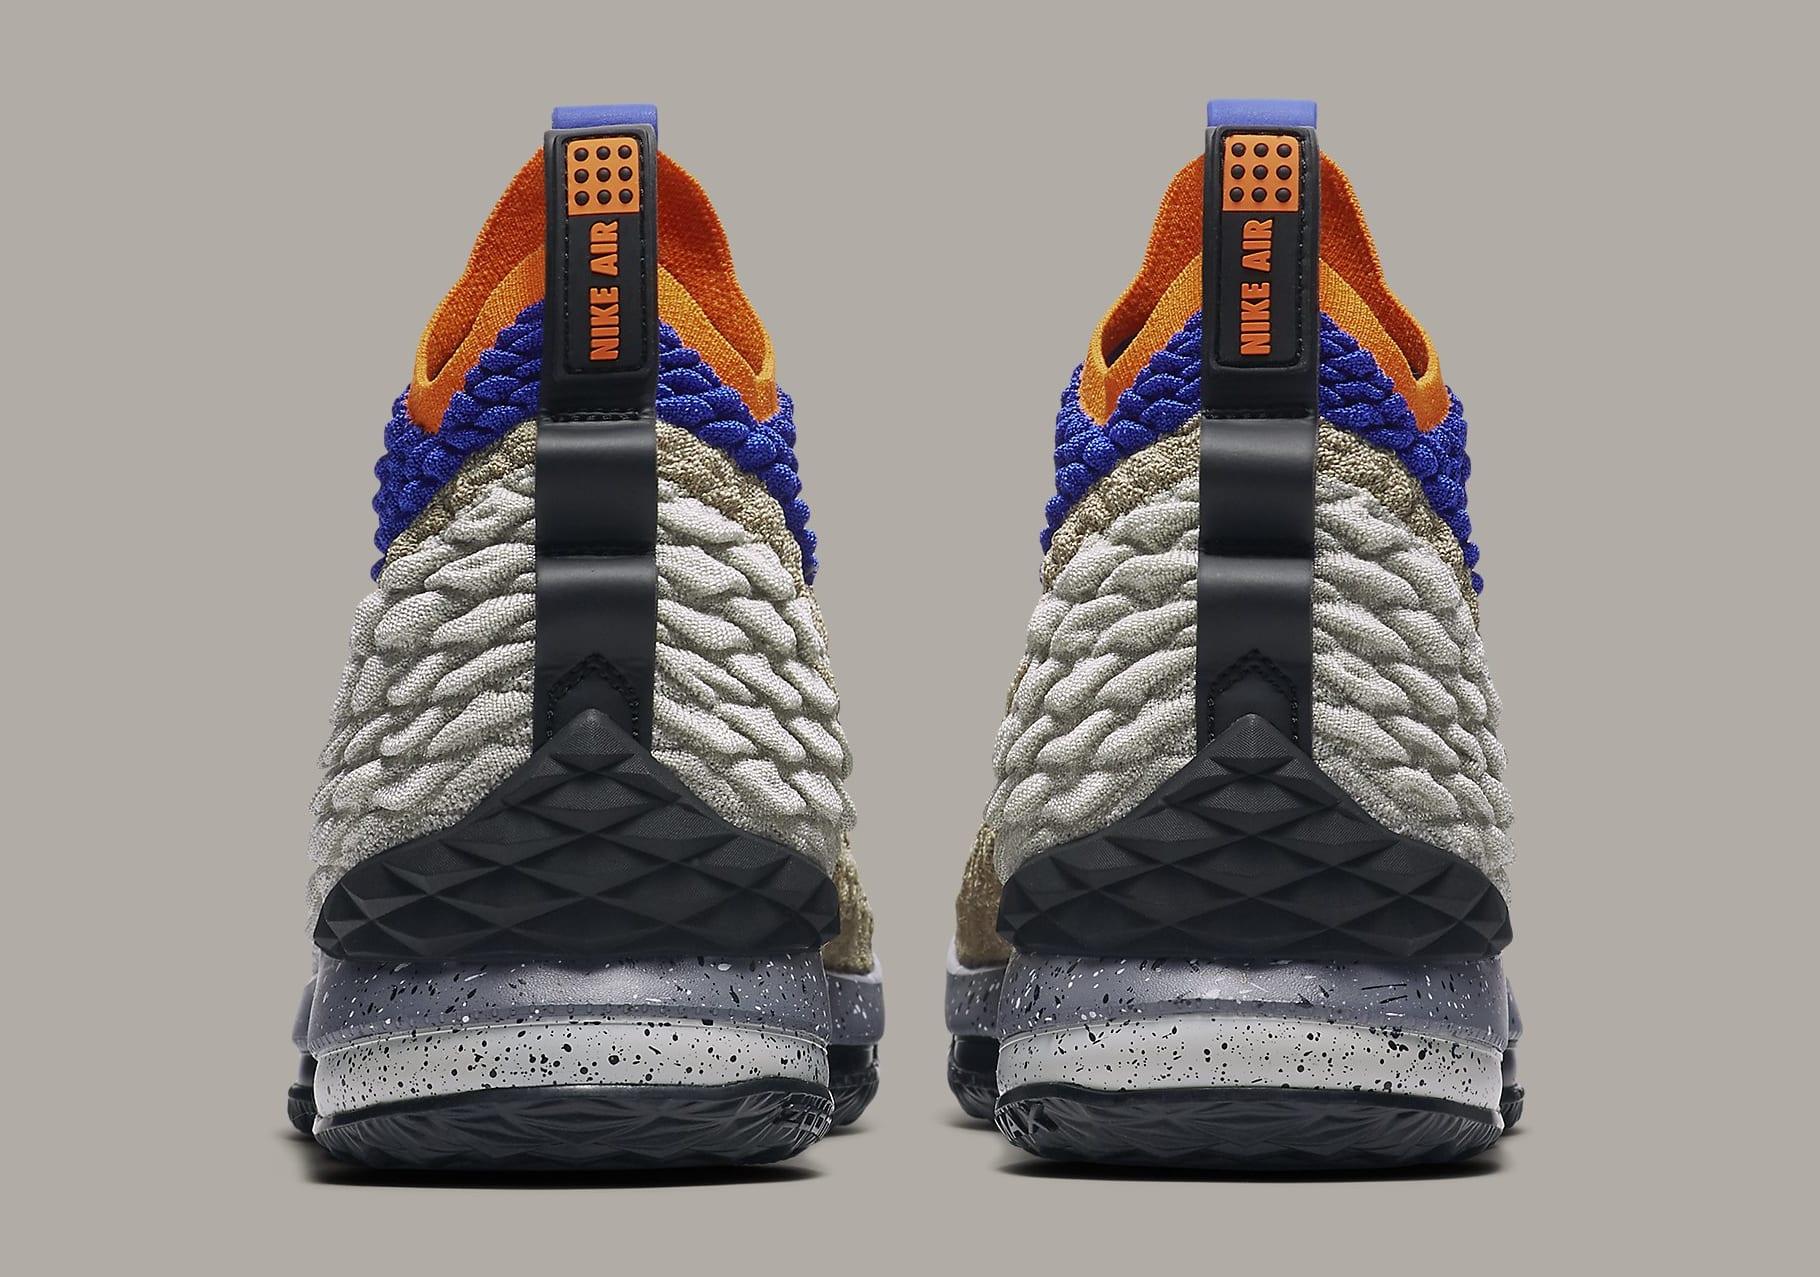 Nike LeBron 15 Mowabb Release Date AR4831-900 Heel